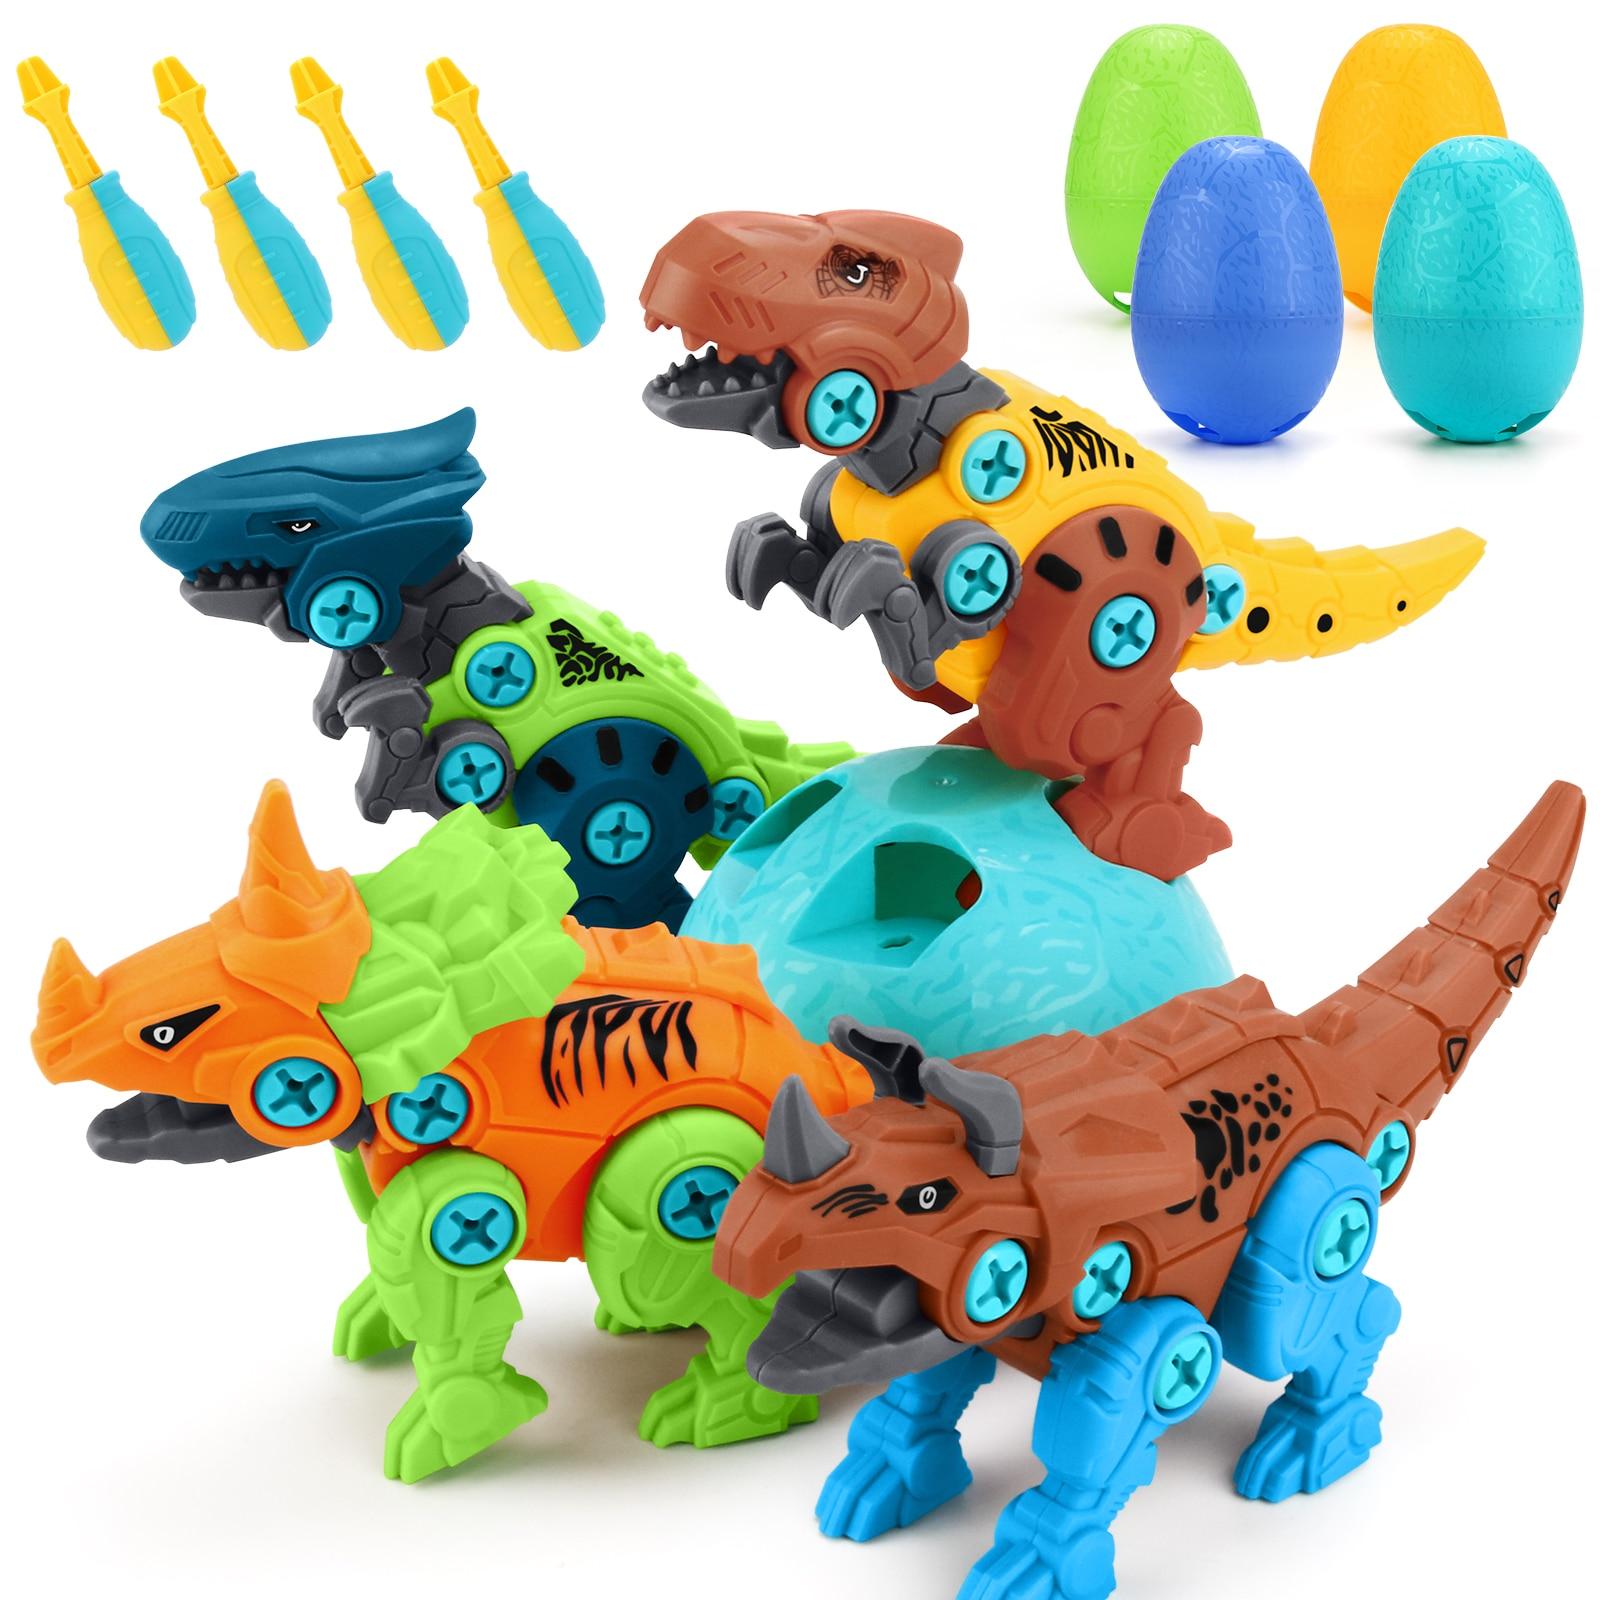 Diy Disassembly Dinosaur Model Toy Set Screw Nut Assembly Plastic Blocks Early Educational Toys for Children Kids Baby Gift